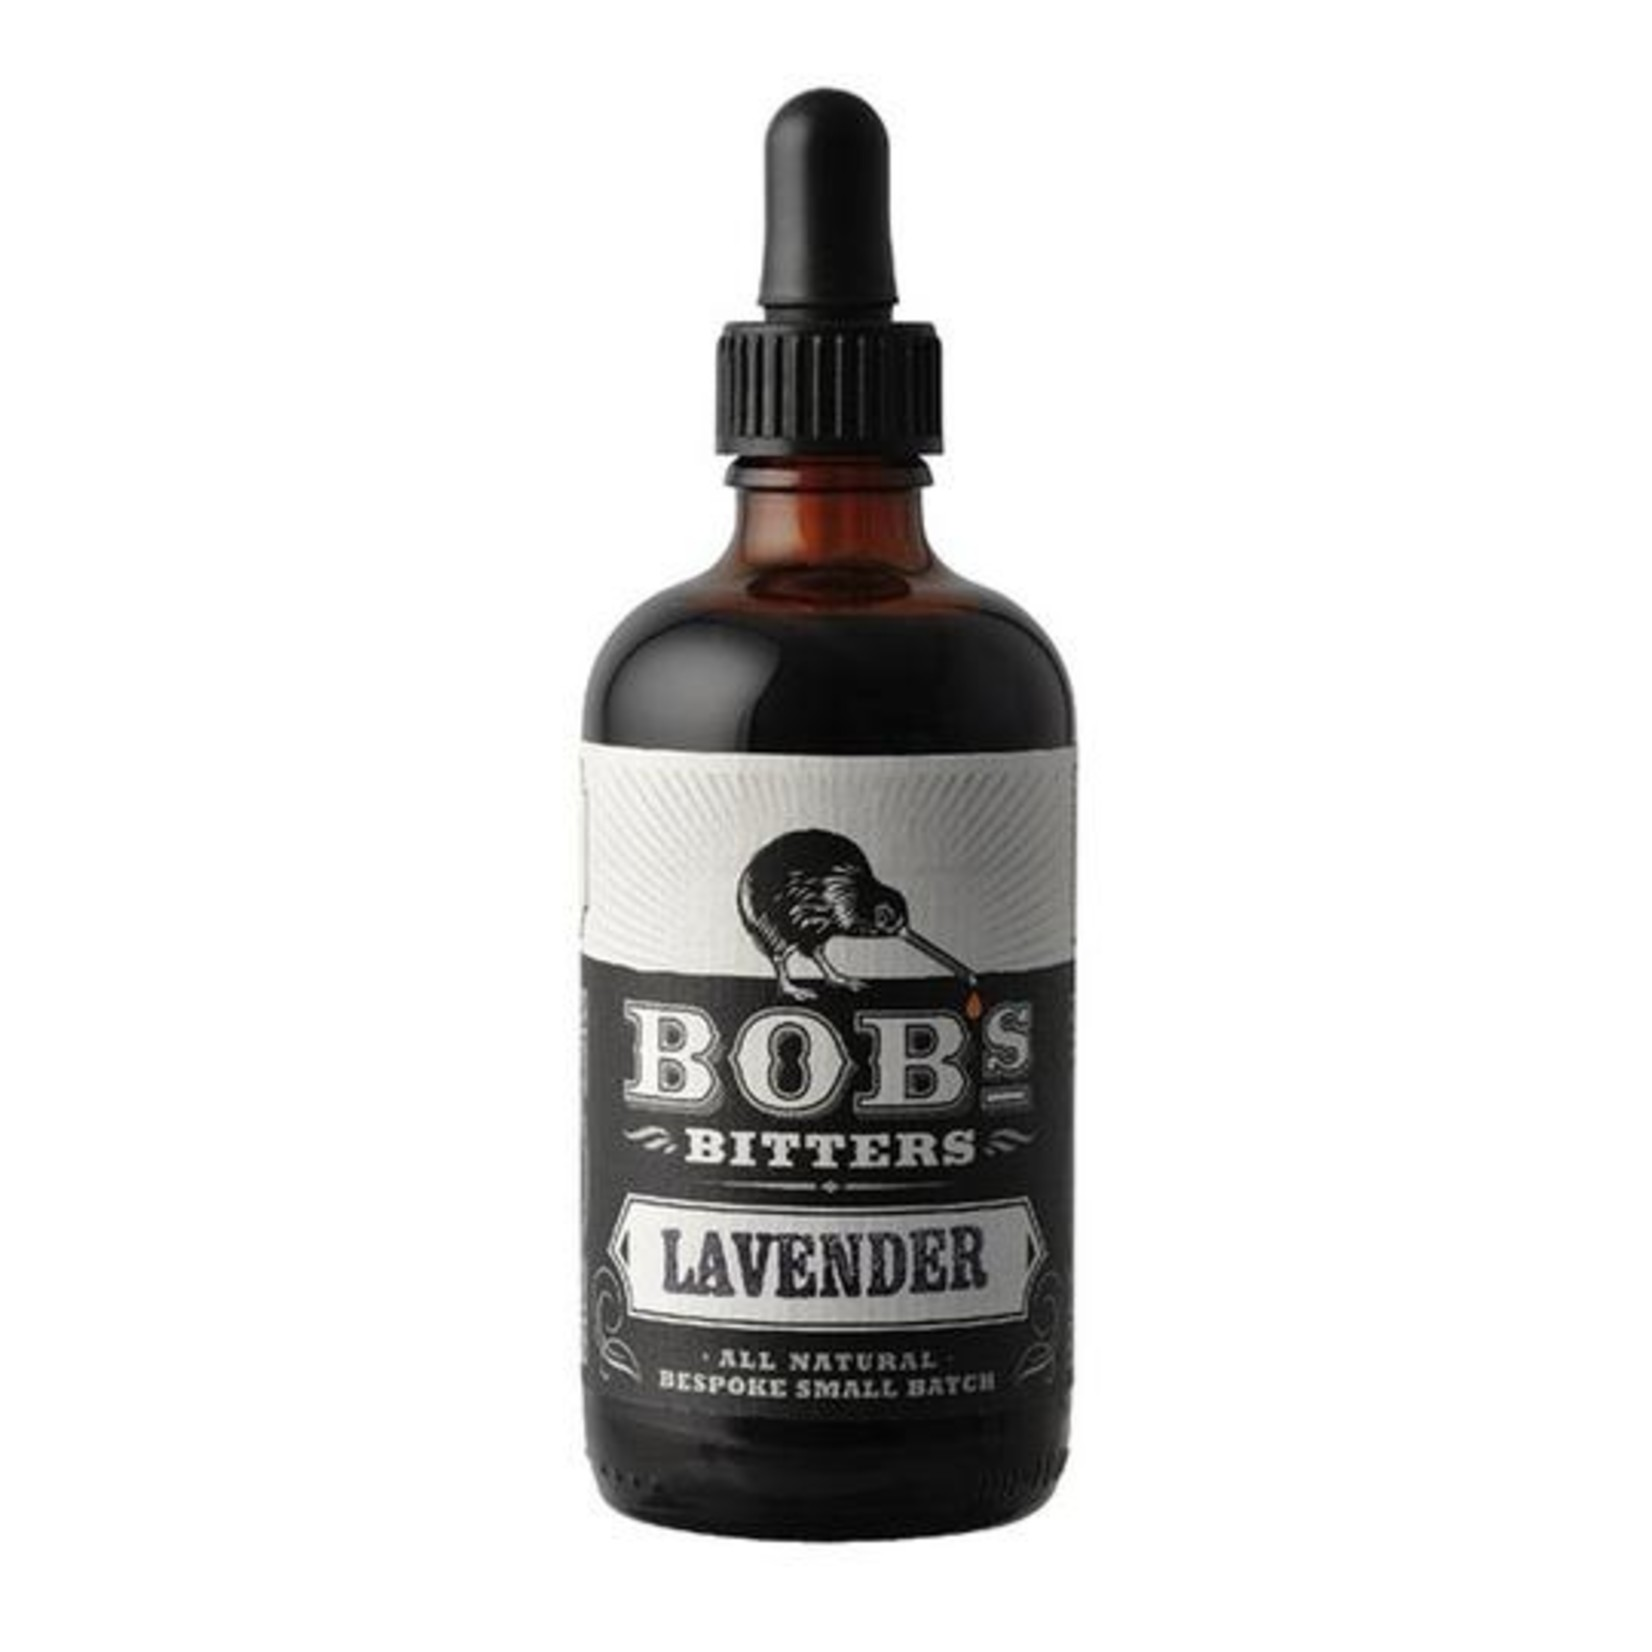 Bob's Bitters Bobs Bitters Lavender